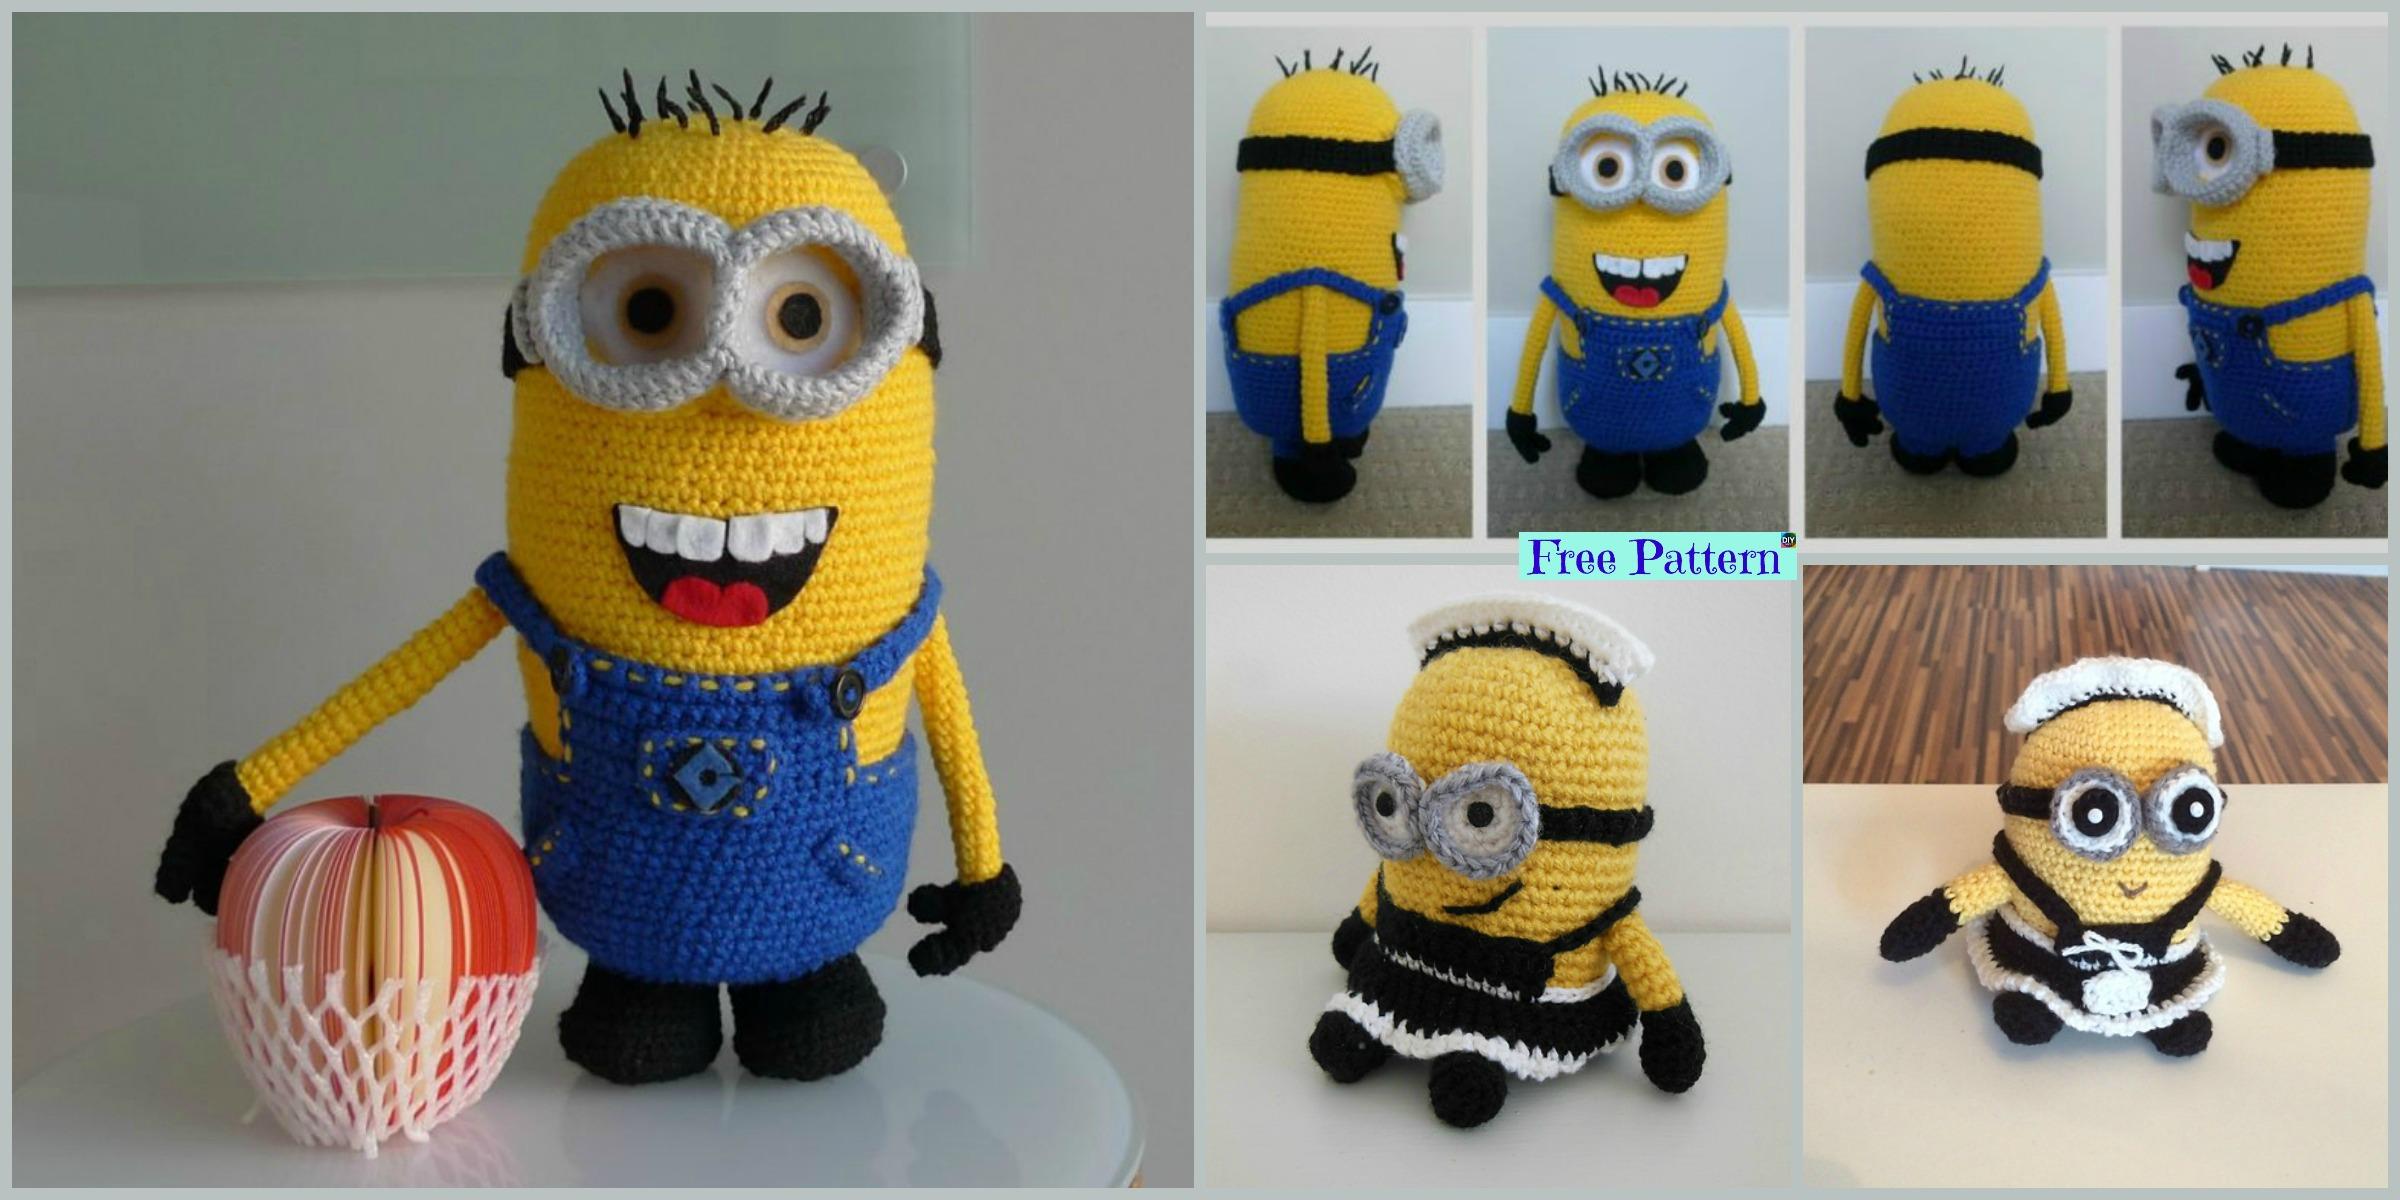 Super Cute Crochet Minion Character- Free Patterns - DIY 4 EVER